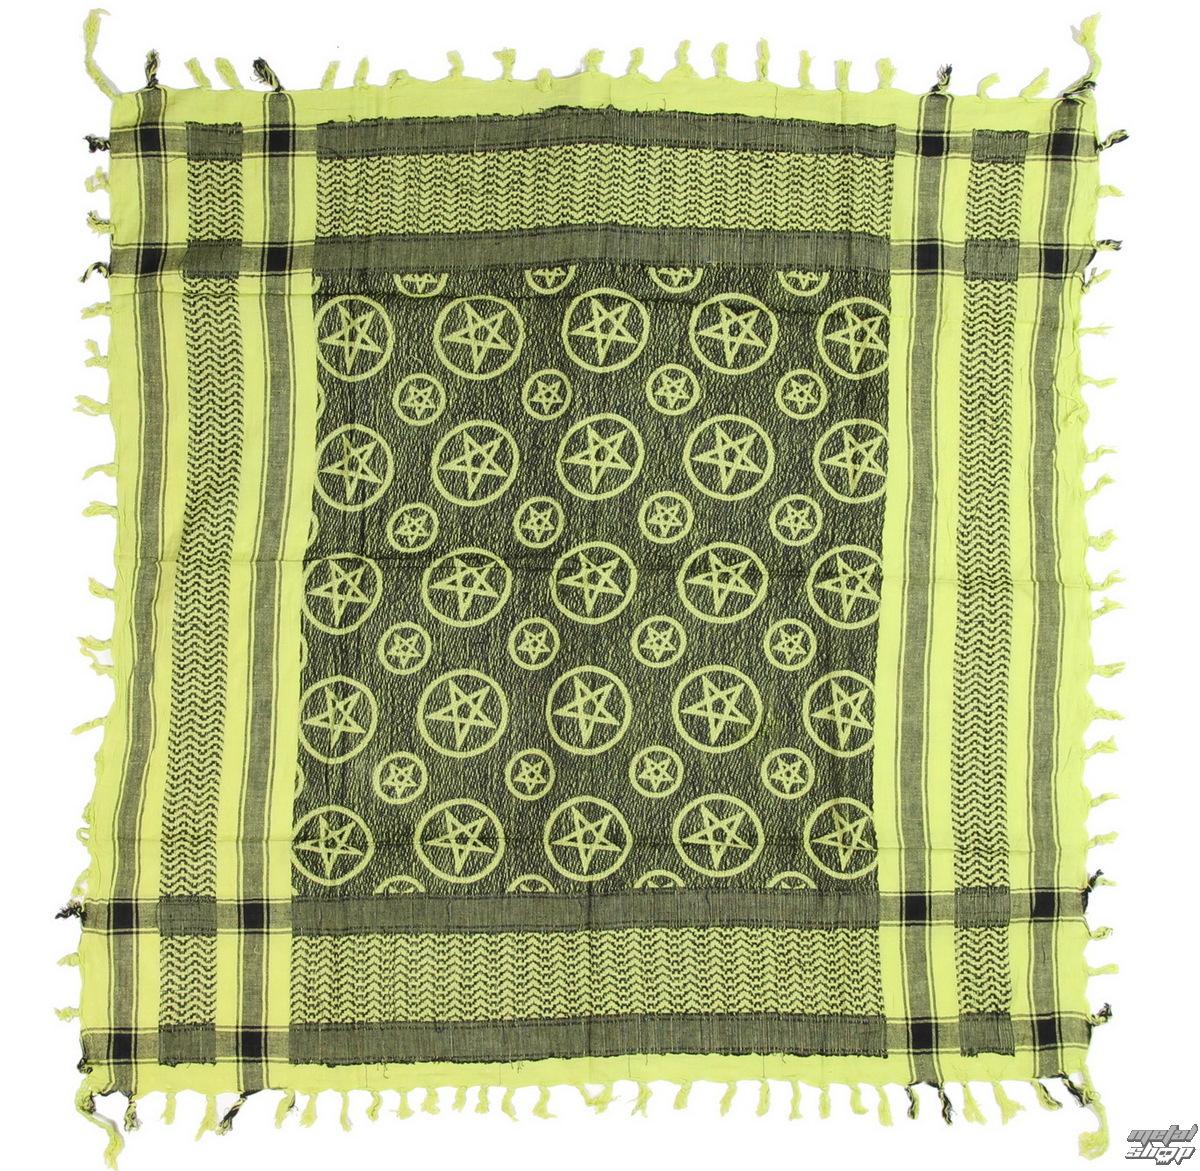 šátek ARAFAT - palestina - PENTAGRAM - APPLE GREEN - metalshop.cz 800796c44f